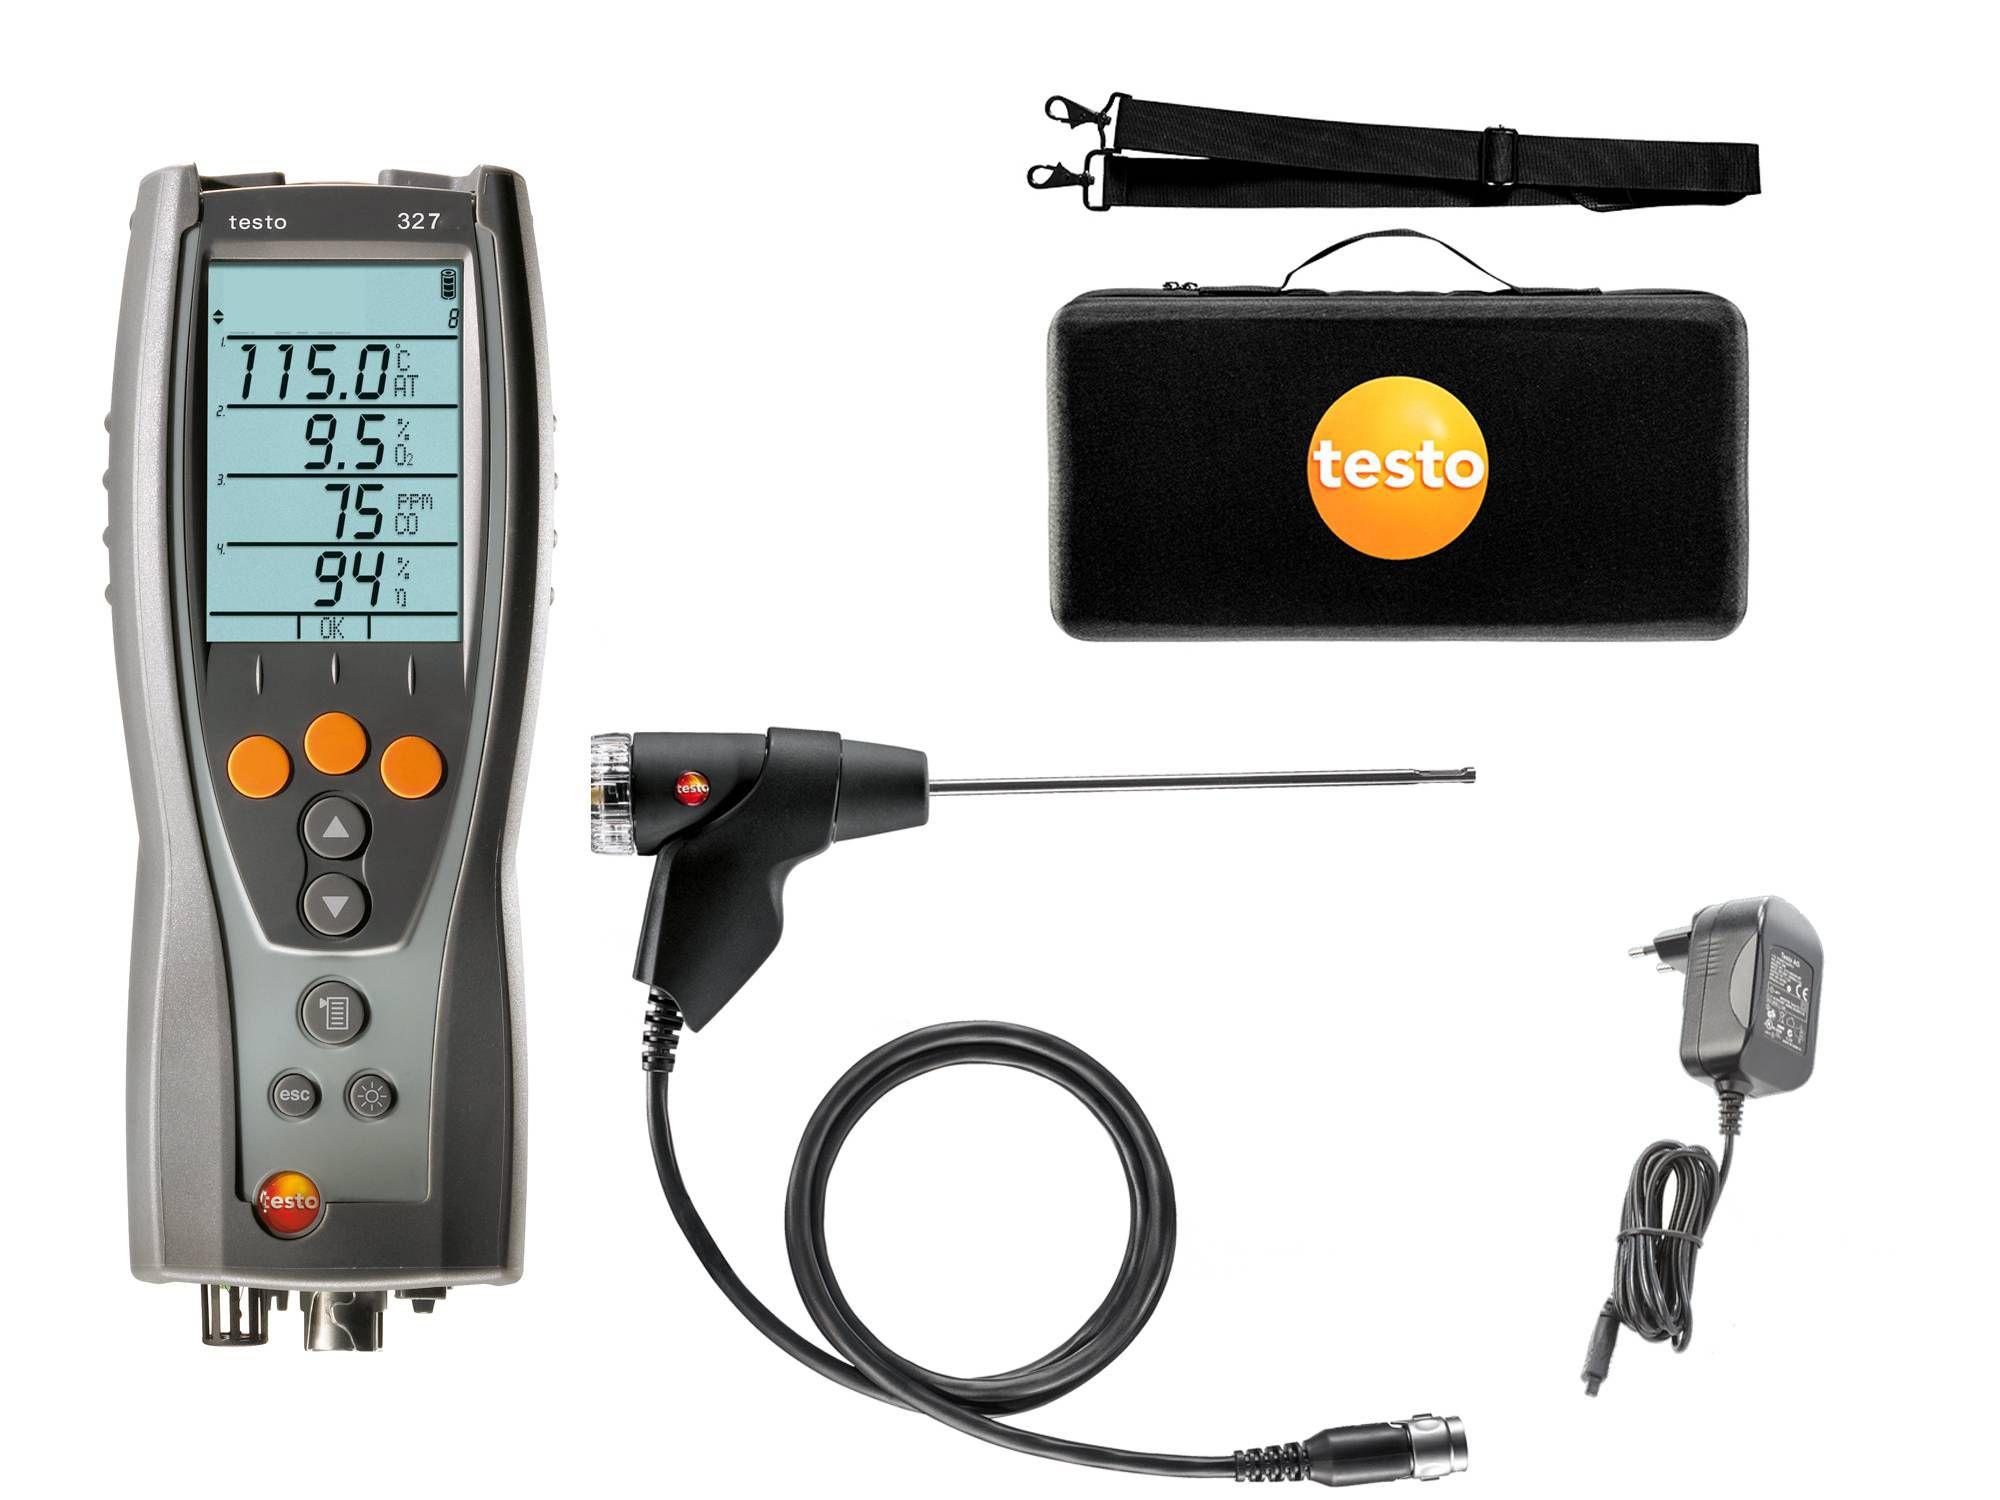 testo-327-1-Standard-Kit-0563-3203-80.jpg